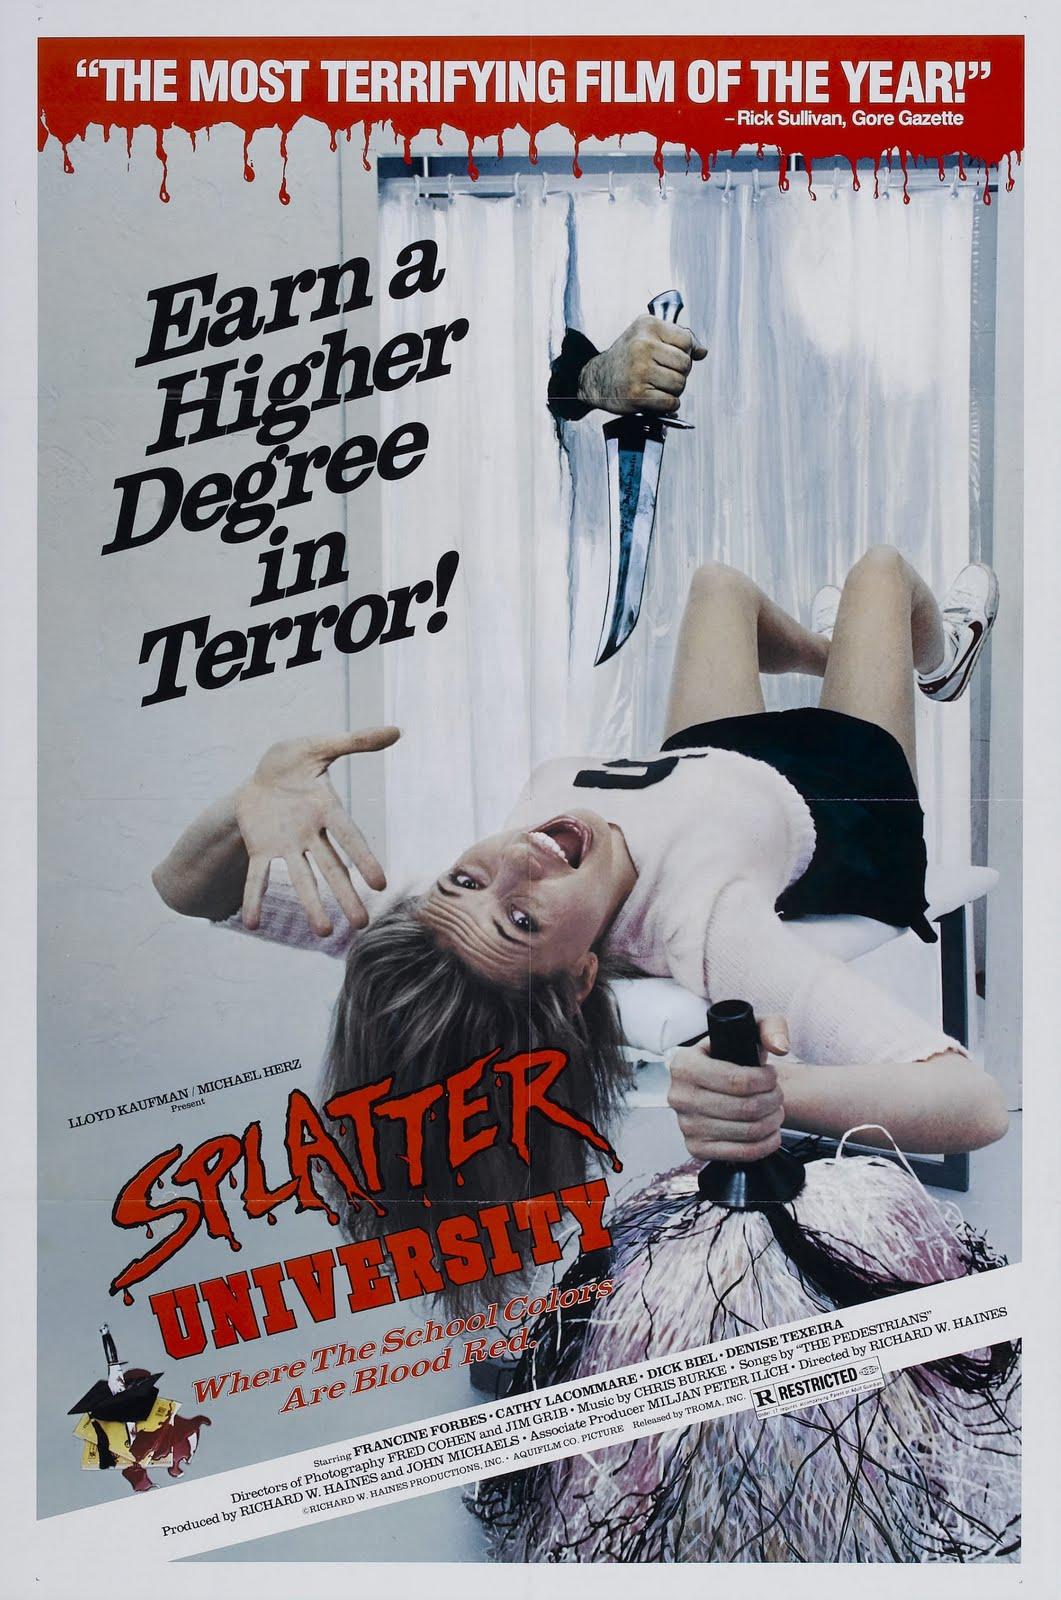 http://2.bp.blogspot.com/_p3z3w9eJaT8/S_N-5WHnVuI/AAAAAAAAAA4/mA8f8wdIyPk/s1600/splatter_university_poster_01.jpg